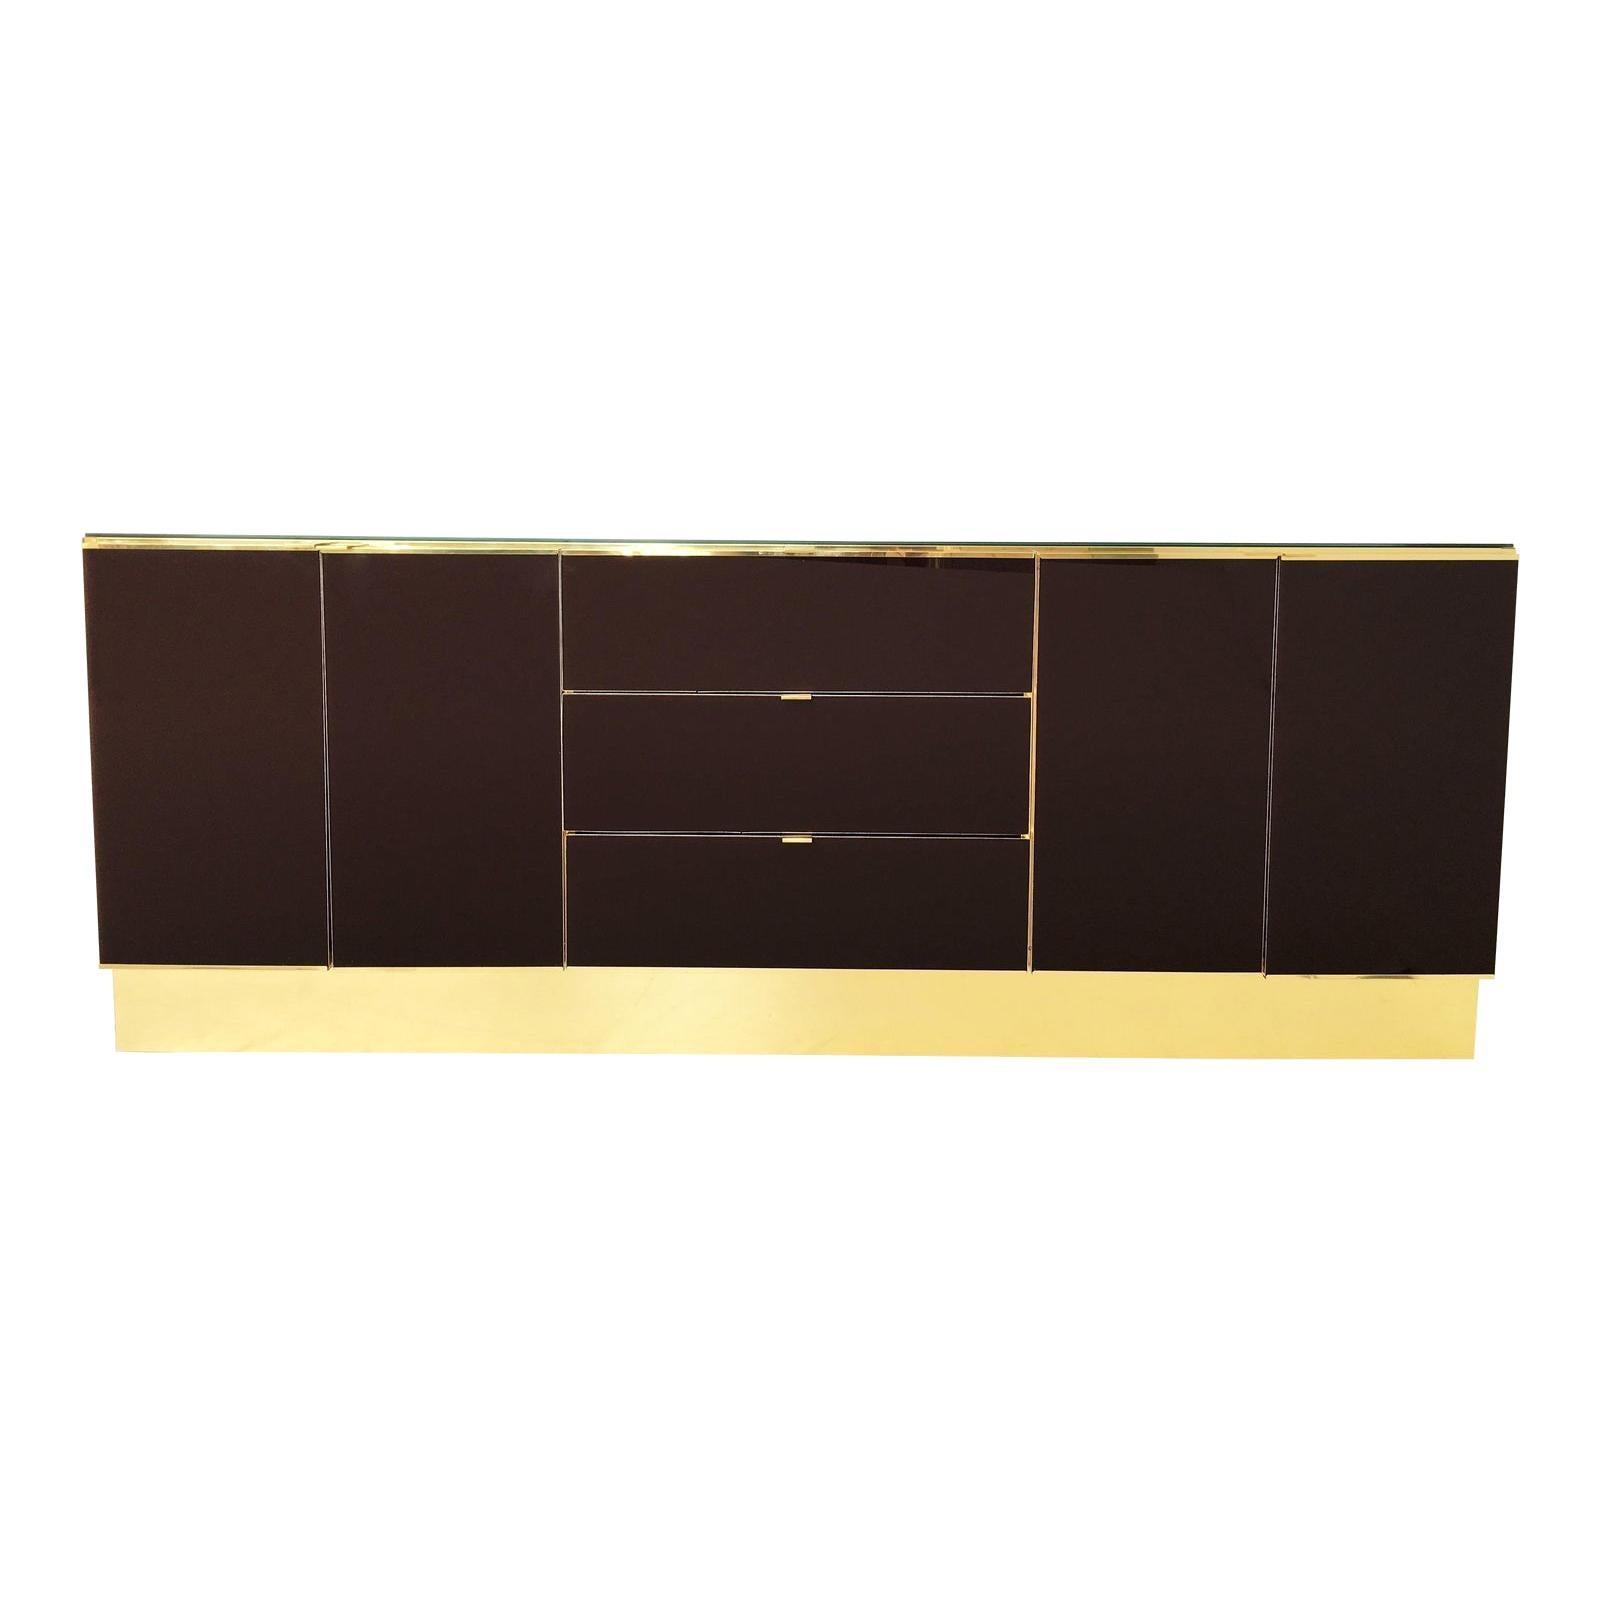 Spectacular Mirrored and Brass Dresser/Credenza by Ello Furniture